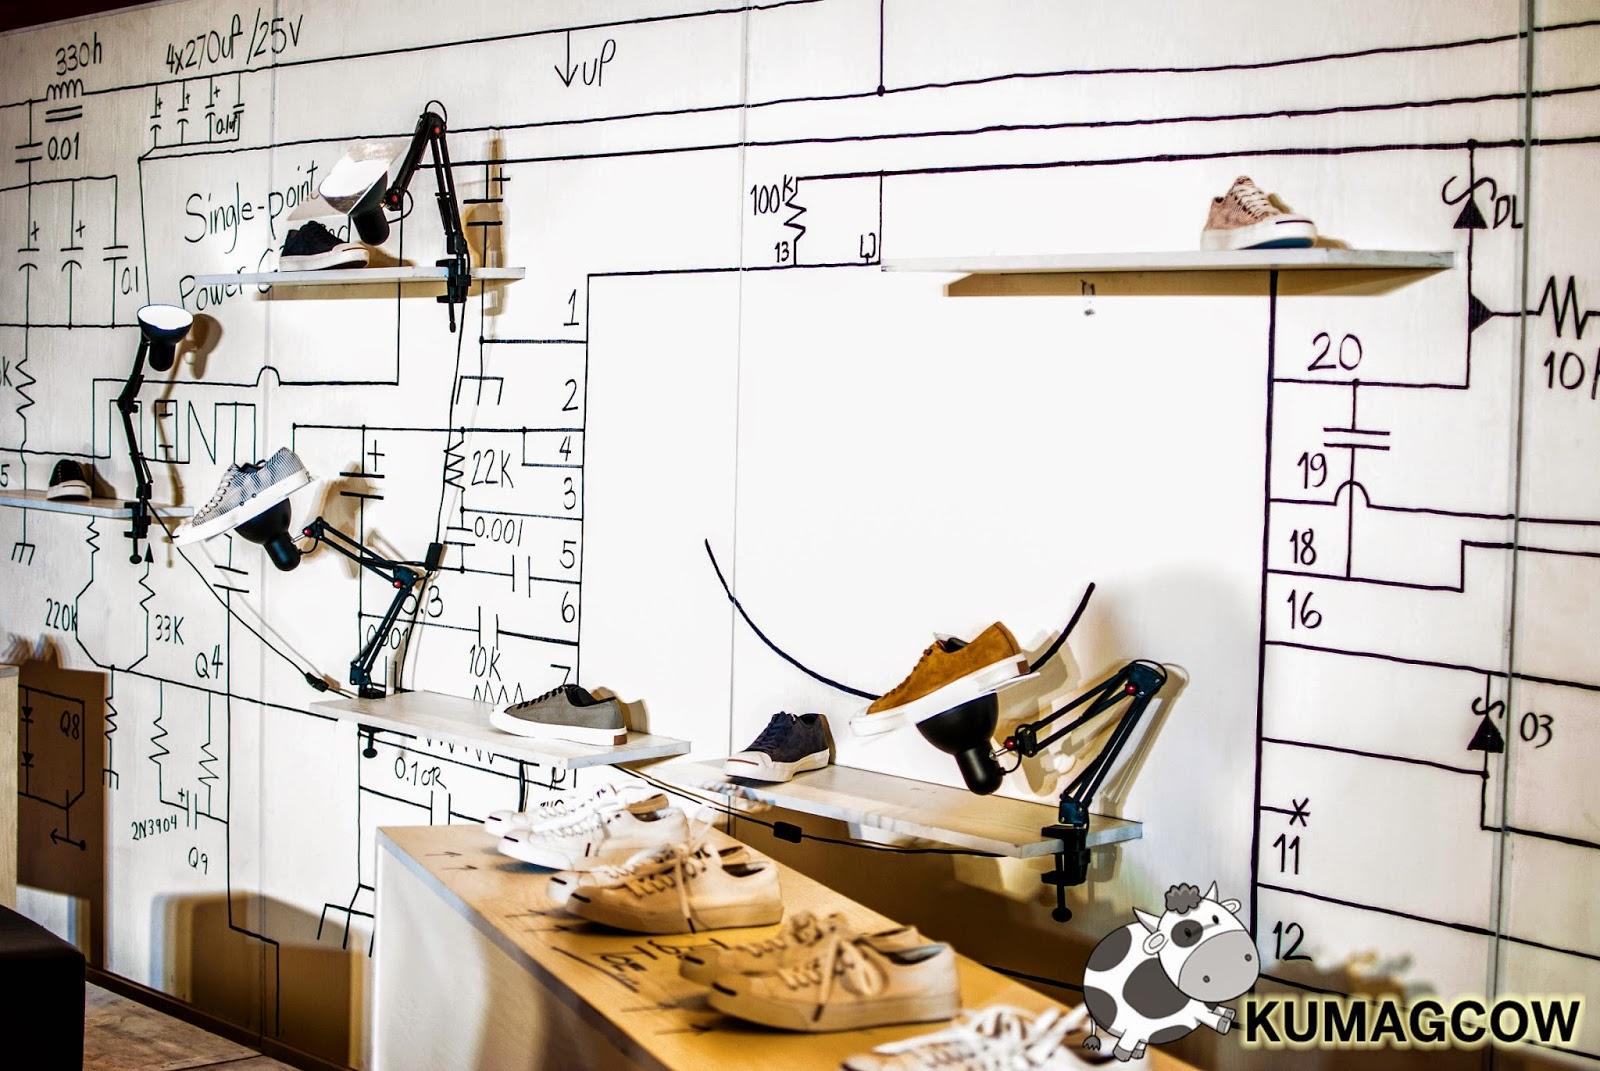 9bd5ad010b41b3 Converse Sneakers Clash - KUMAGCOW.COM